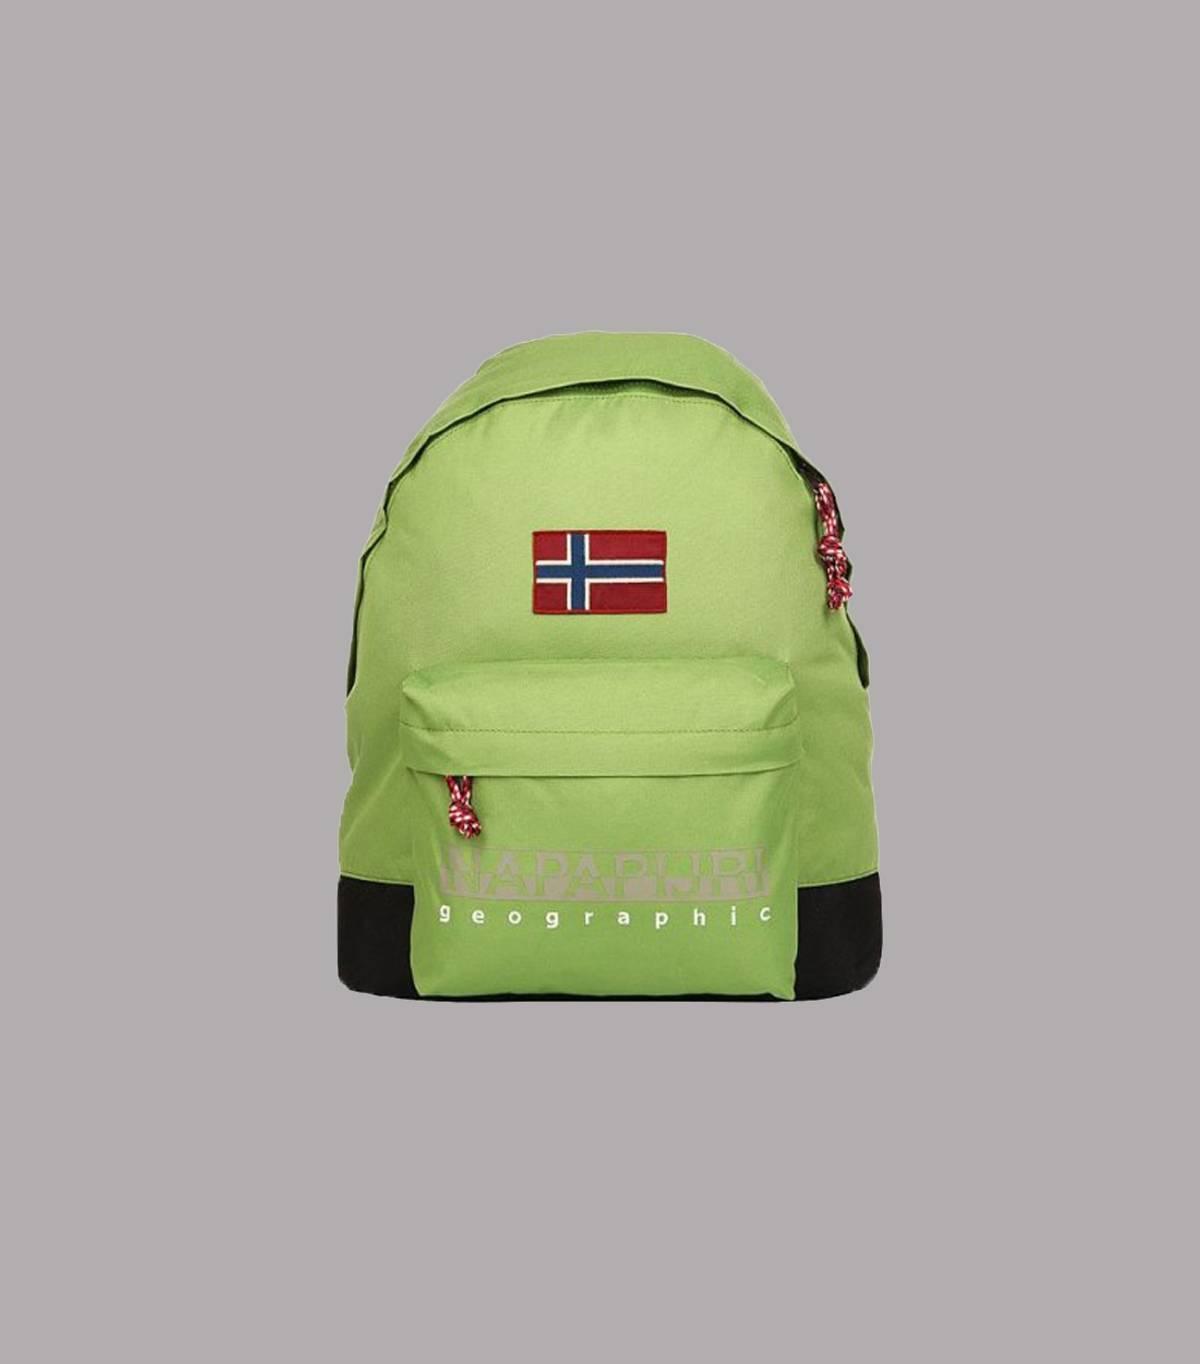 Napapijri Napapijri Hack Backpack